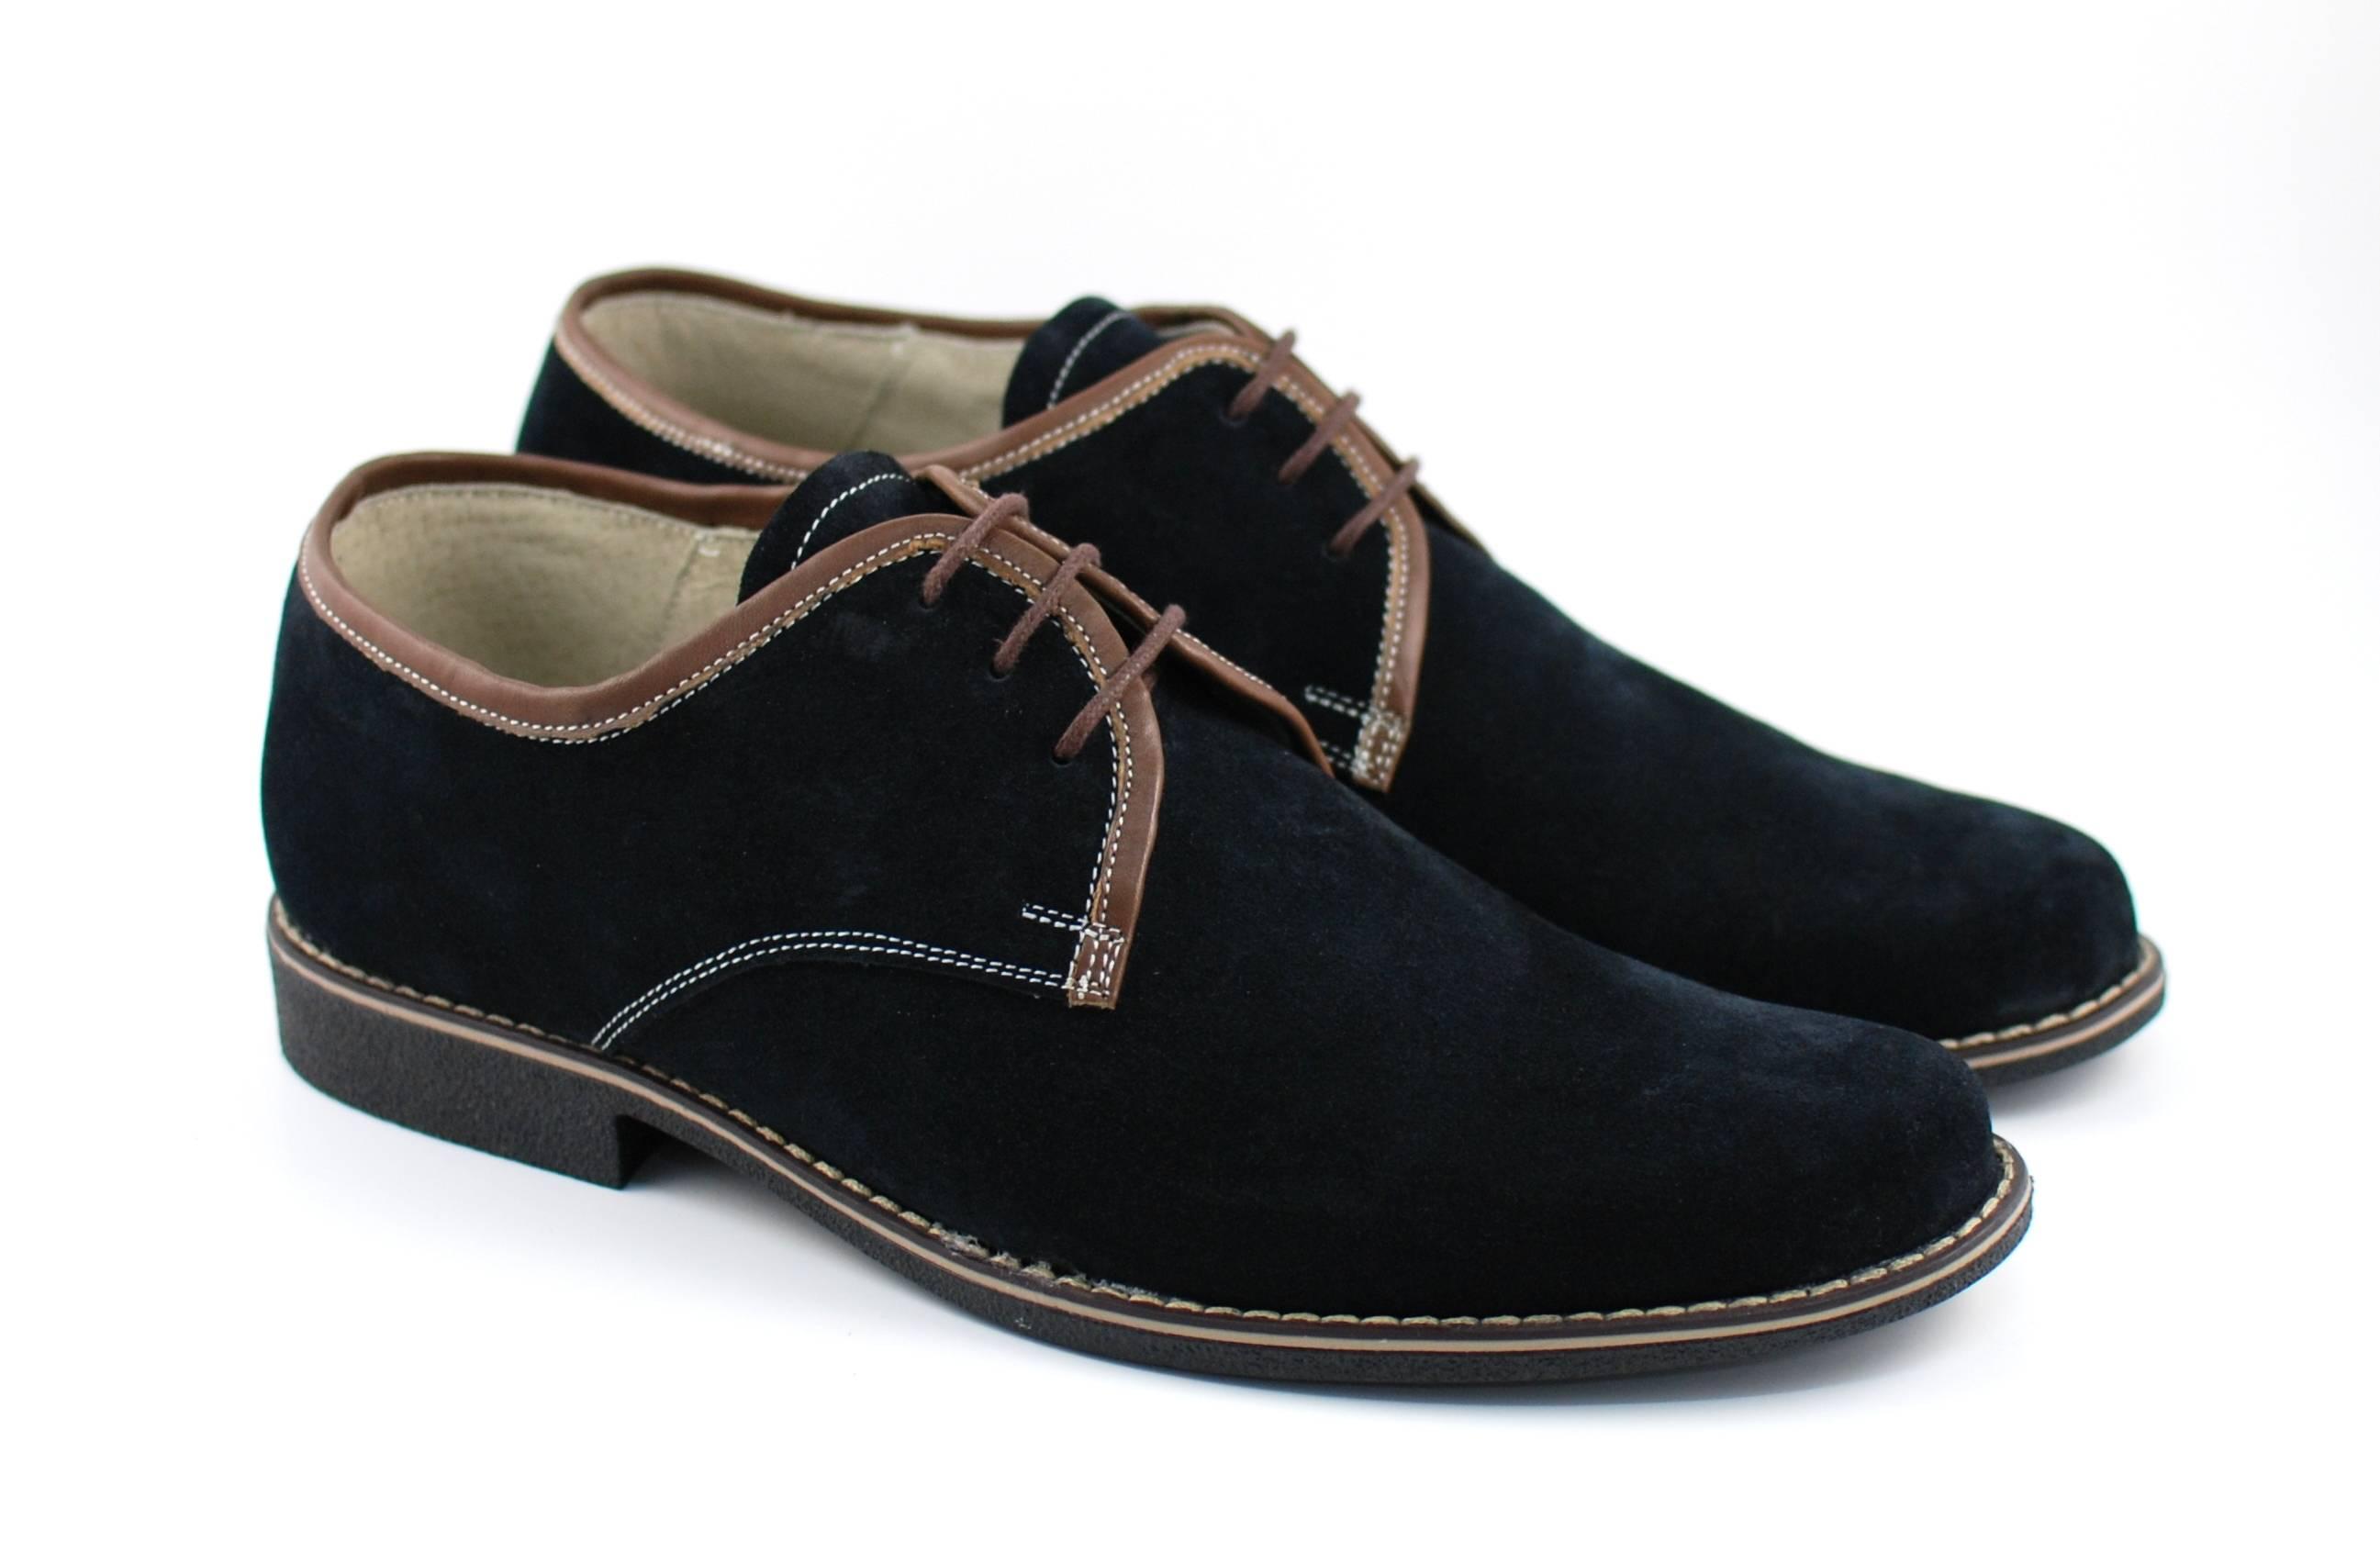 Pantofi barbati casual din piele naturala intoarsa, culoare neagra, P34NM